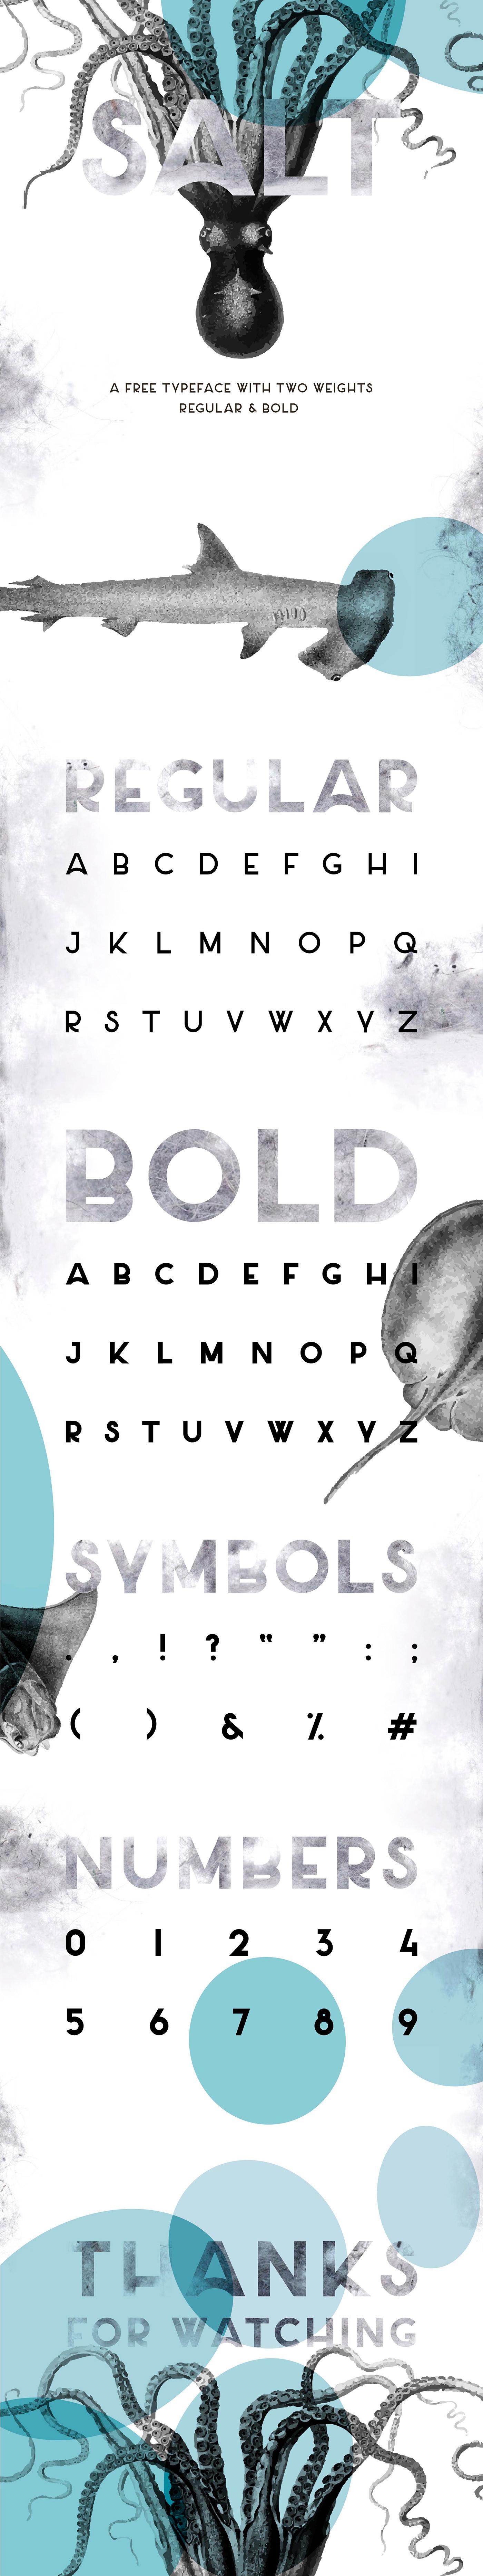 free font sans serif minimalist Salt uppercase masha chuprova irkutsk